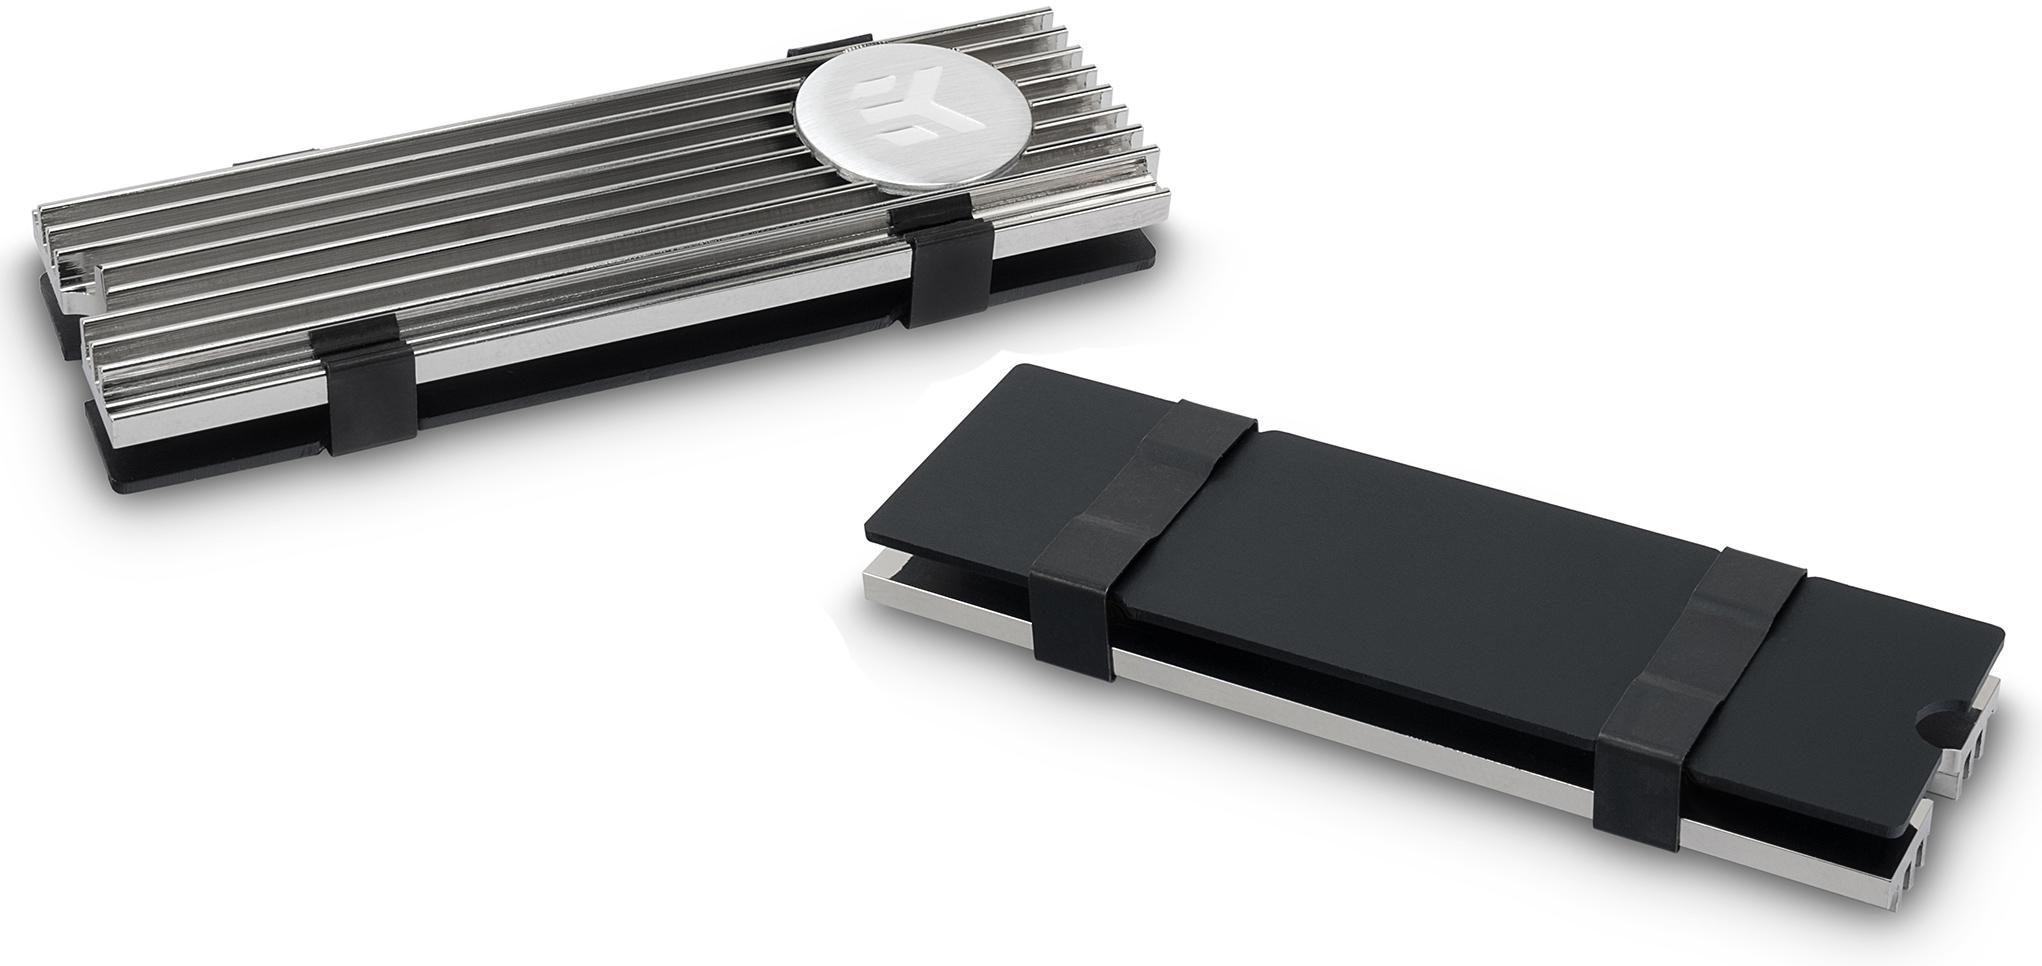 EKWB Launches Aftermarket EK-M 2 Aluminum Heatsink for M 2 SSDs